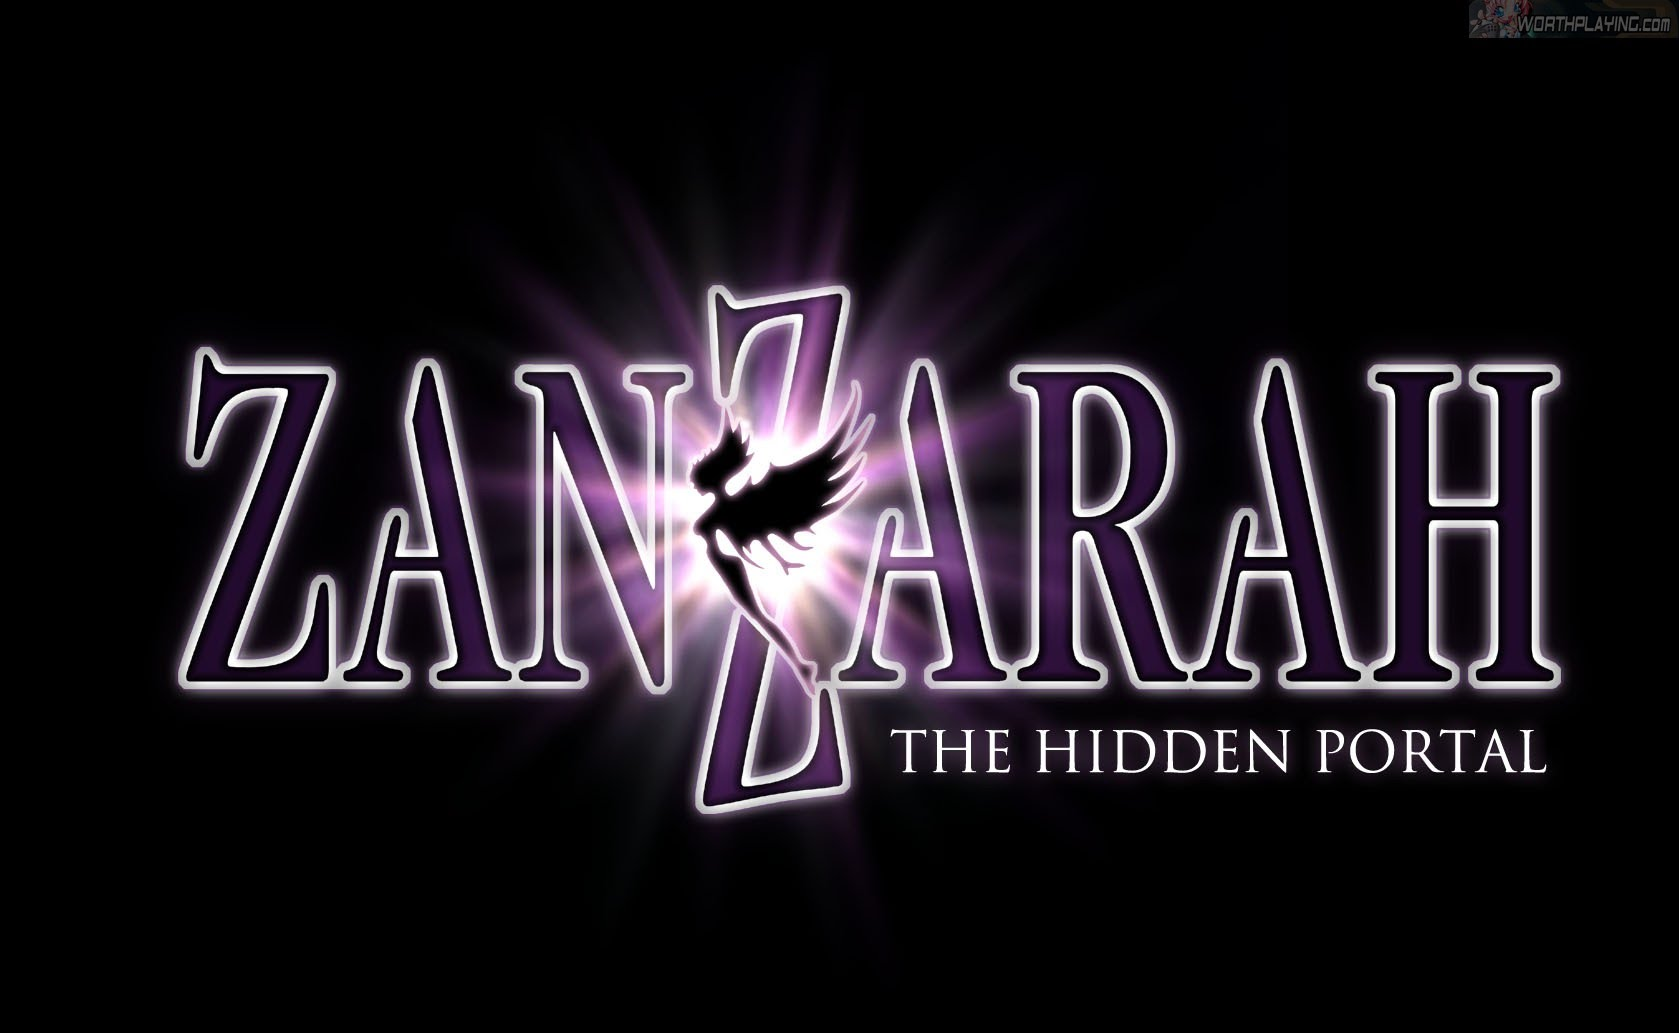 ZanZarah Trailer [ENG]